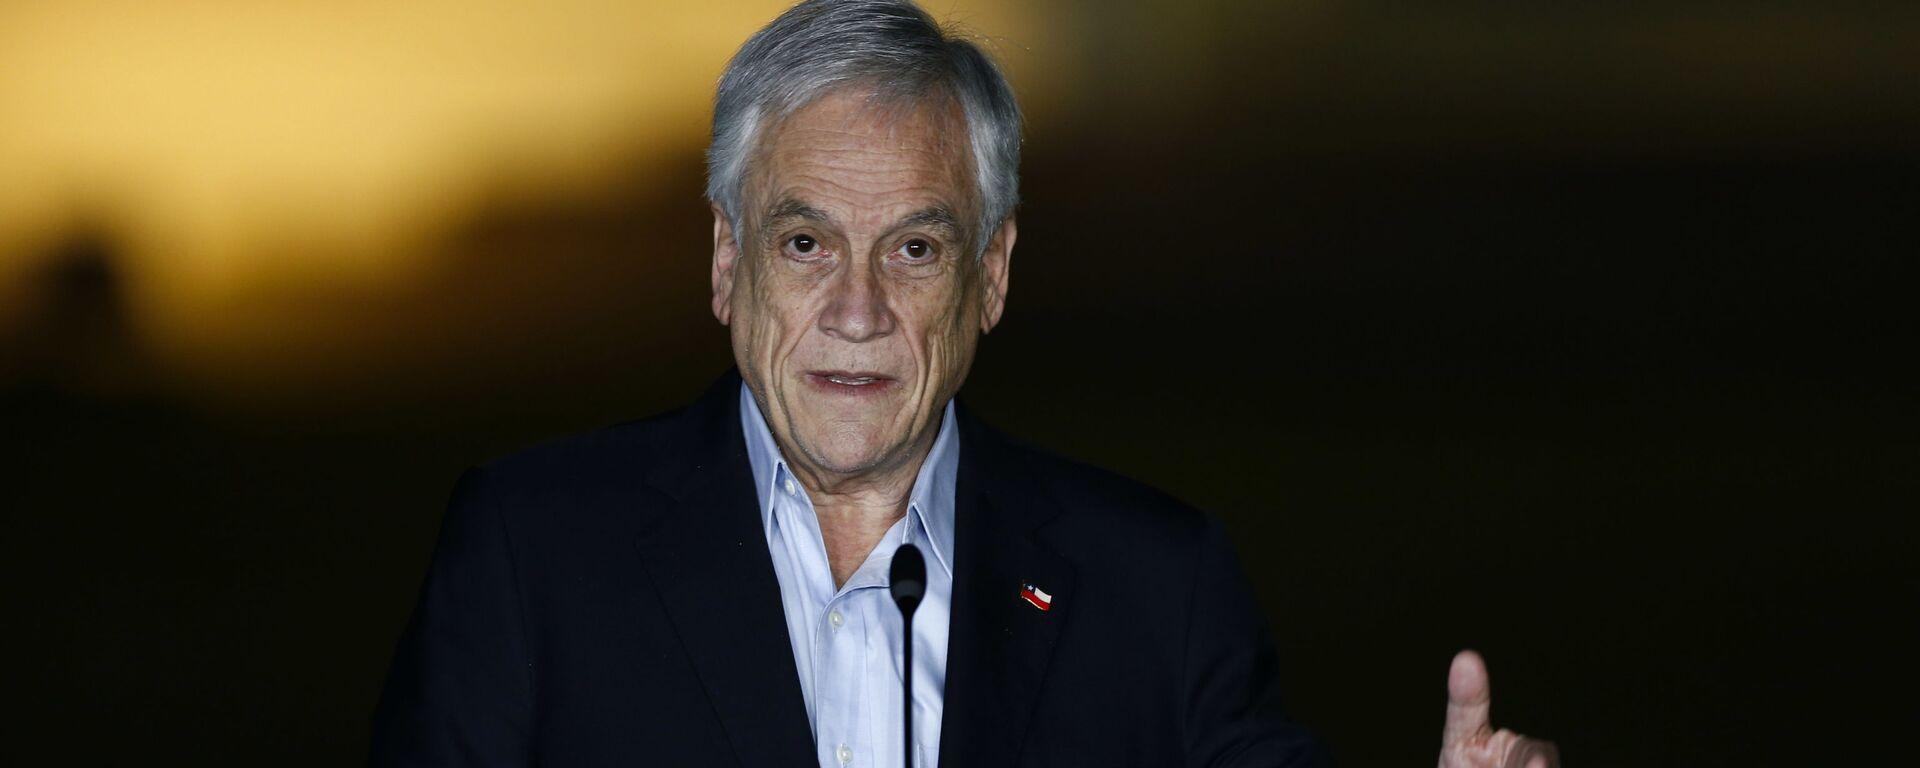 Sebastián Piñera, presidente de Chile - Sputnik Mundo, 1920, 11.06.2021